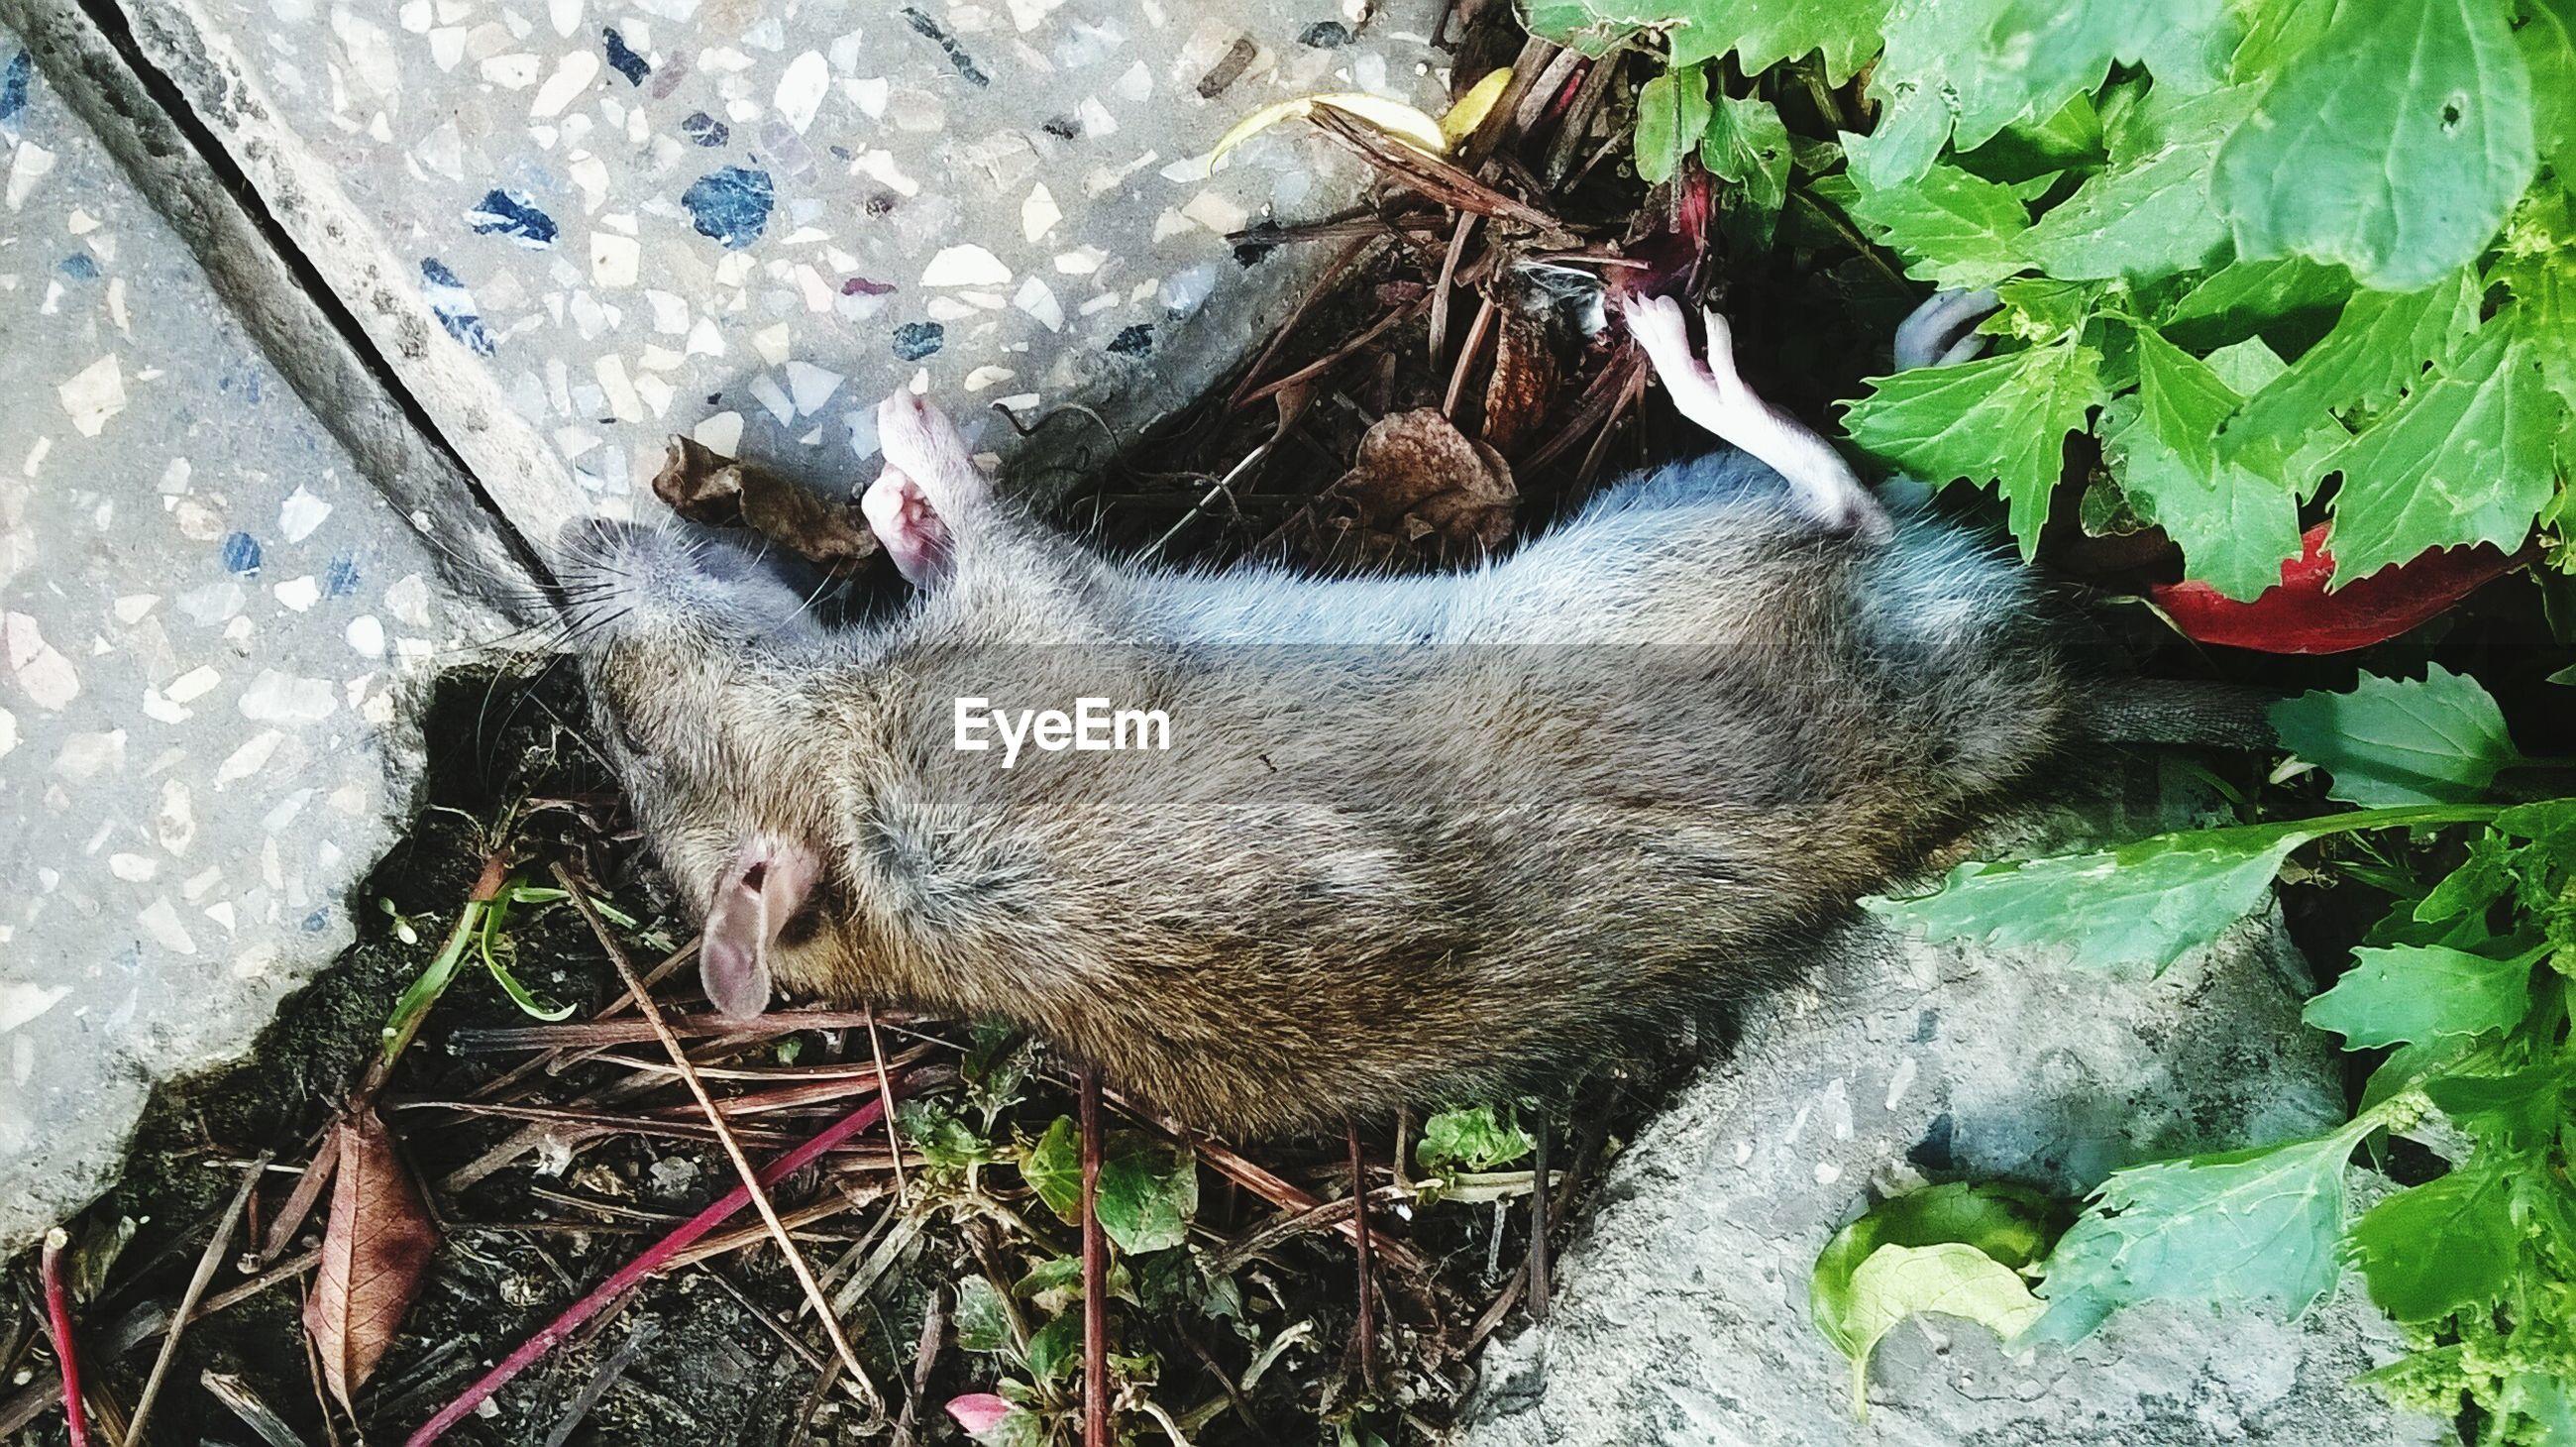 Close-up view of dead rat